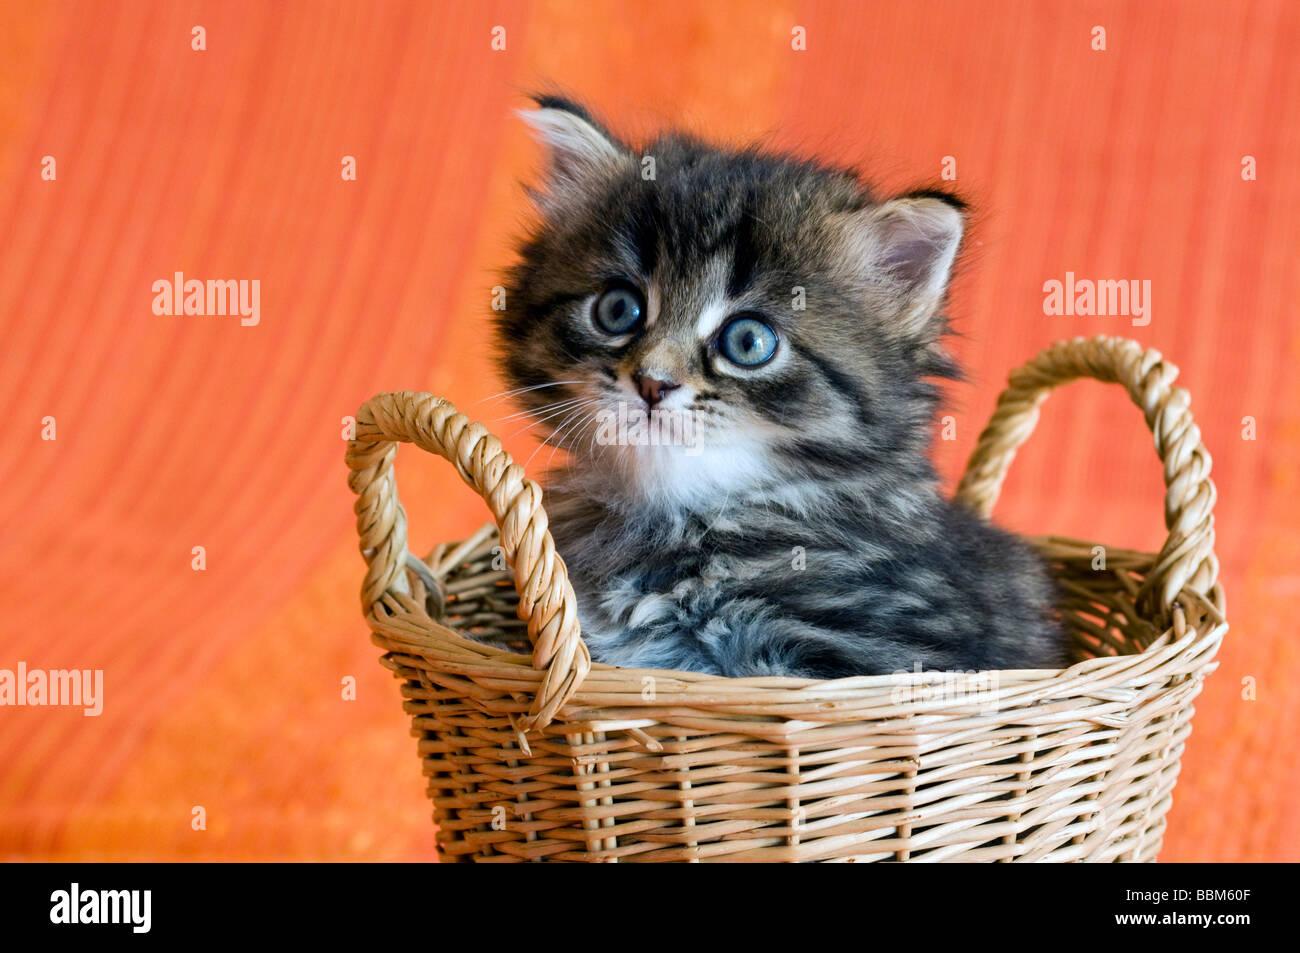 Domestic cat, kitten - Stock Image